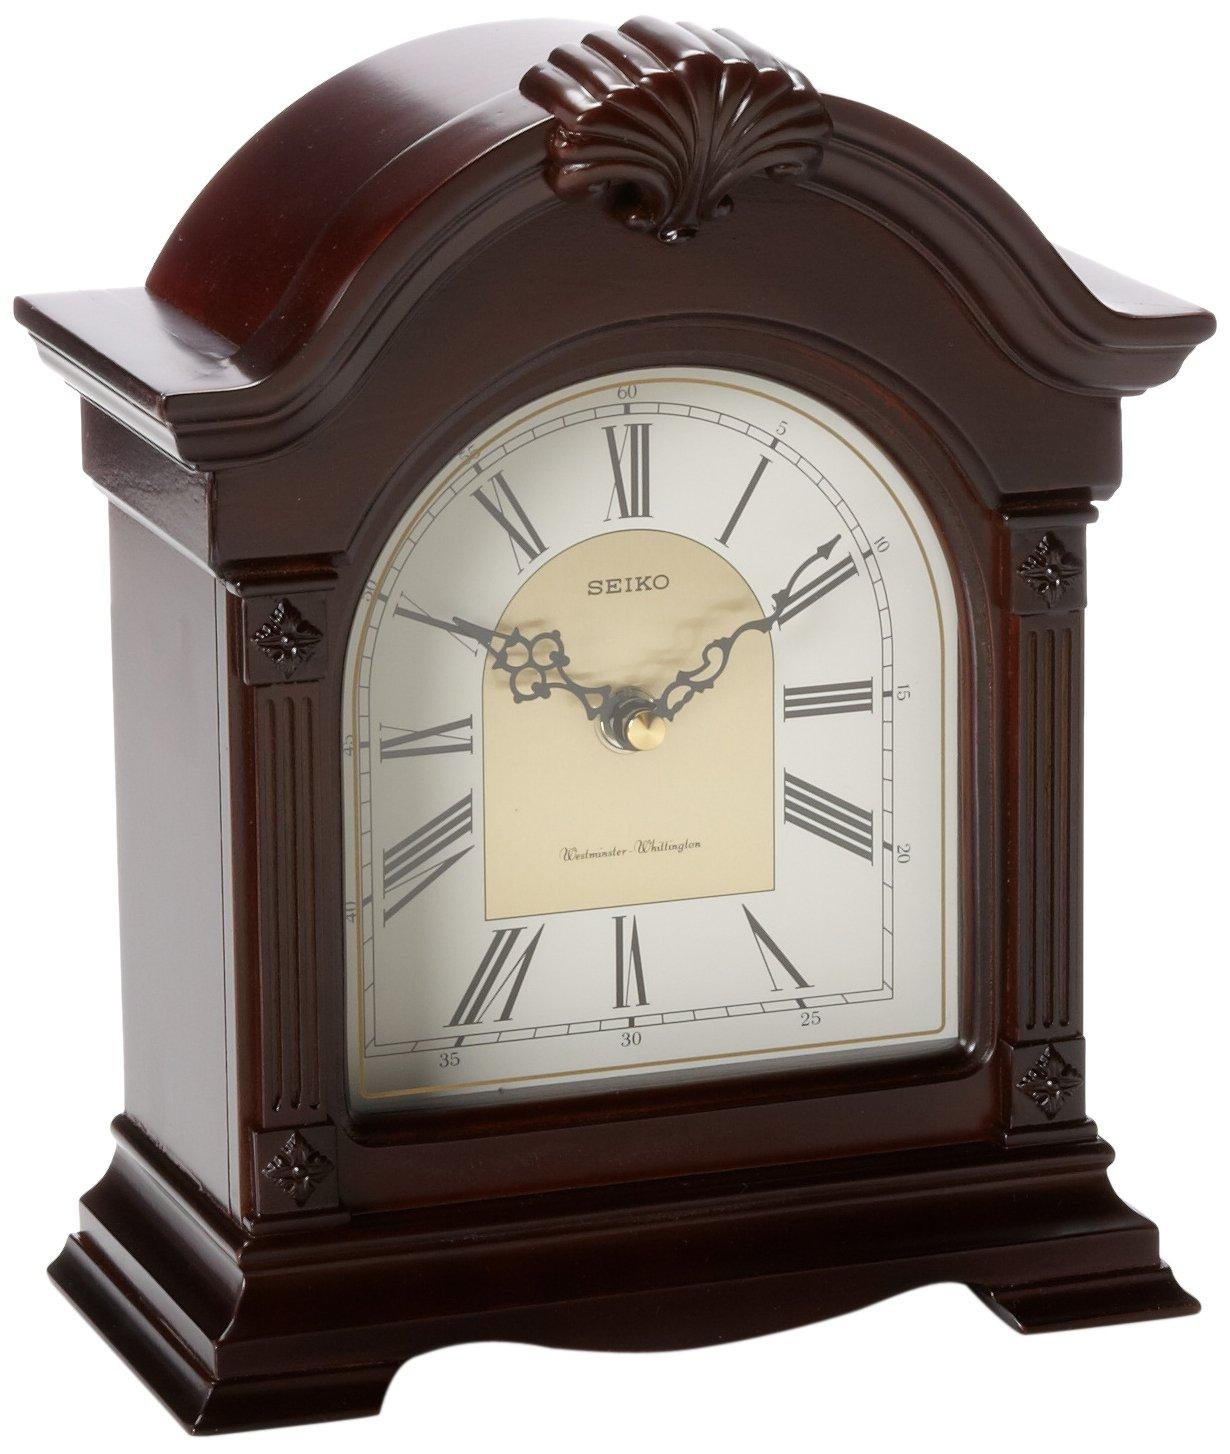 Seiko Pendulum Clock image